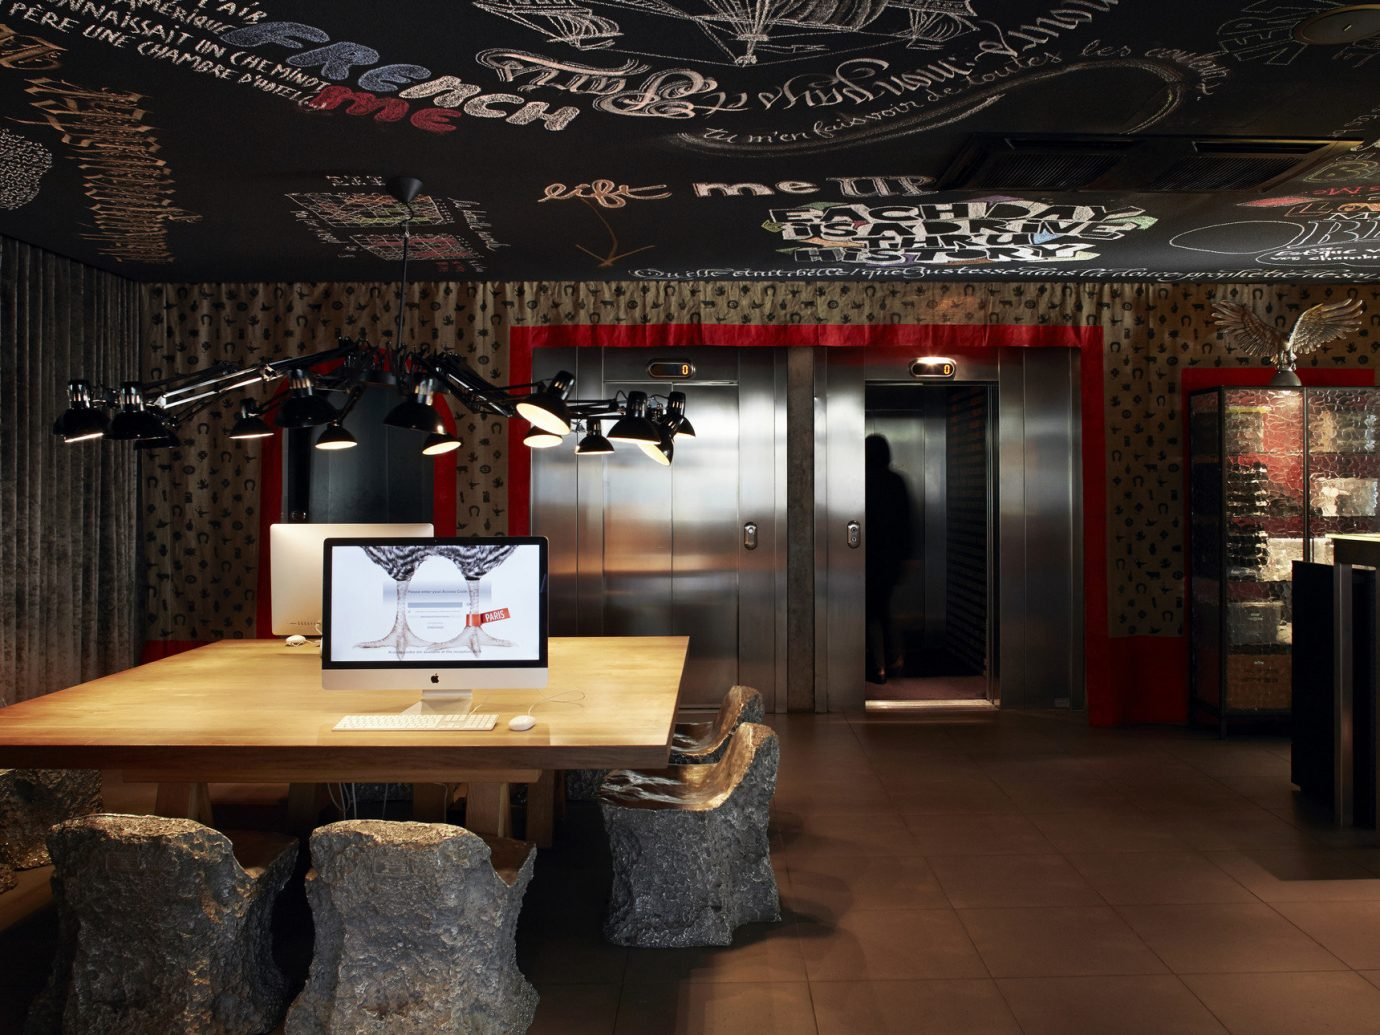 Hotels indoor floor Living room interior design restaurant Bar Lobby Design Boutique wood furniture